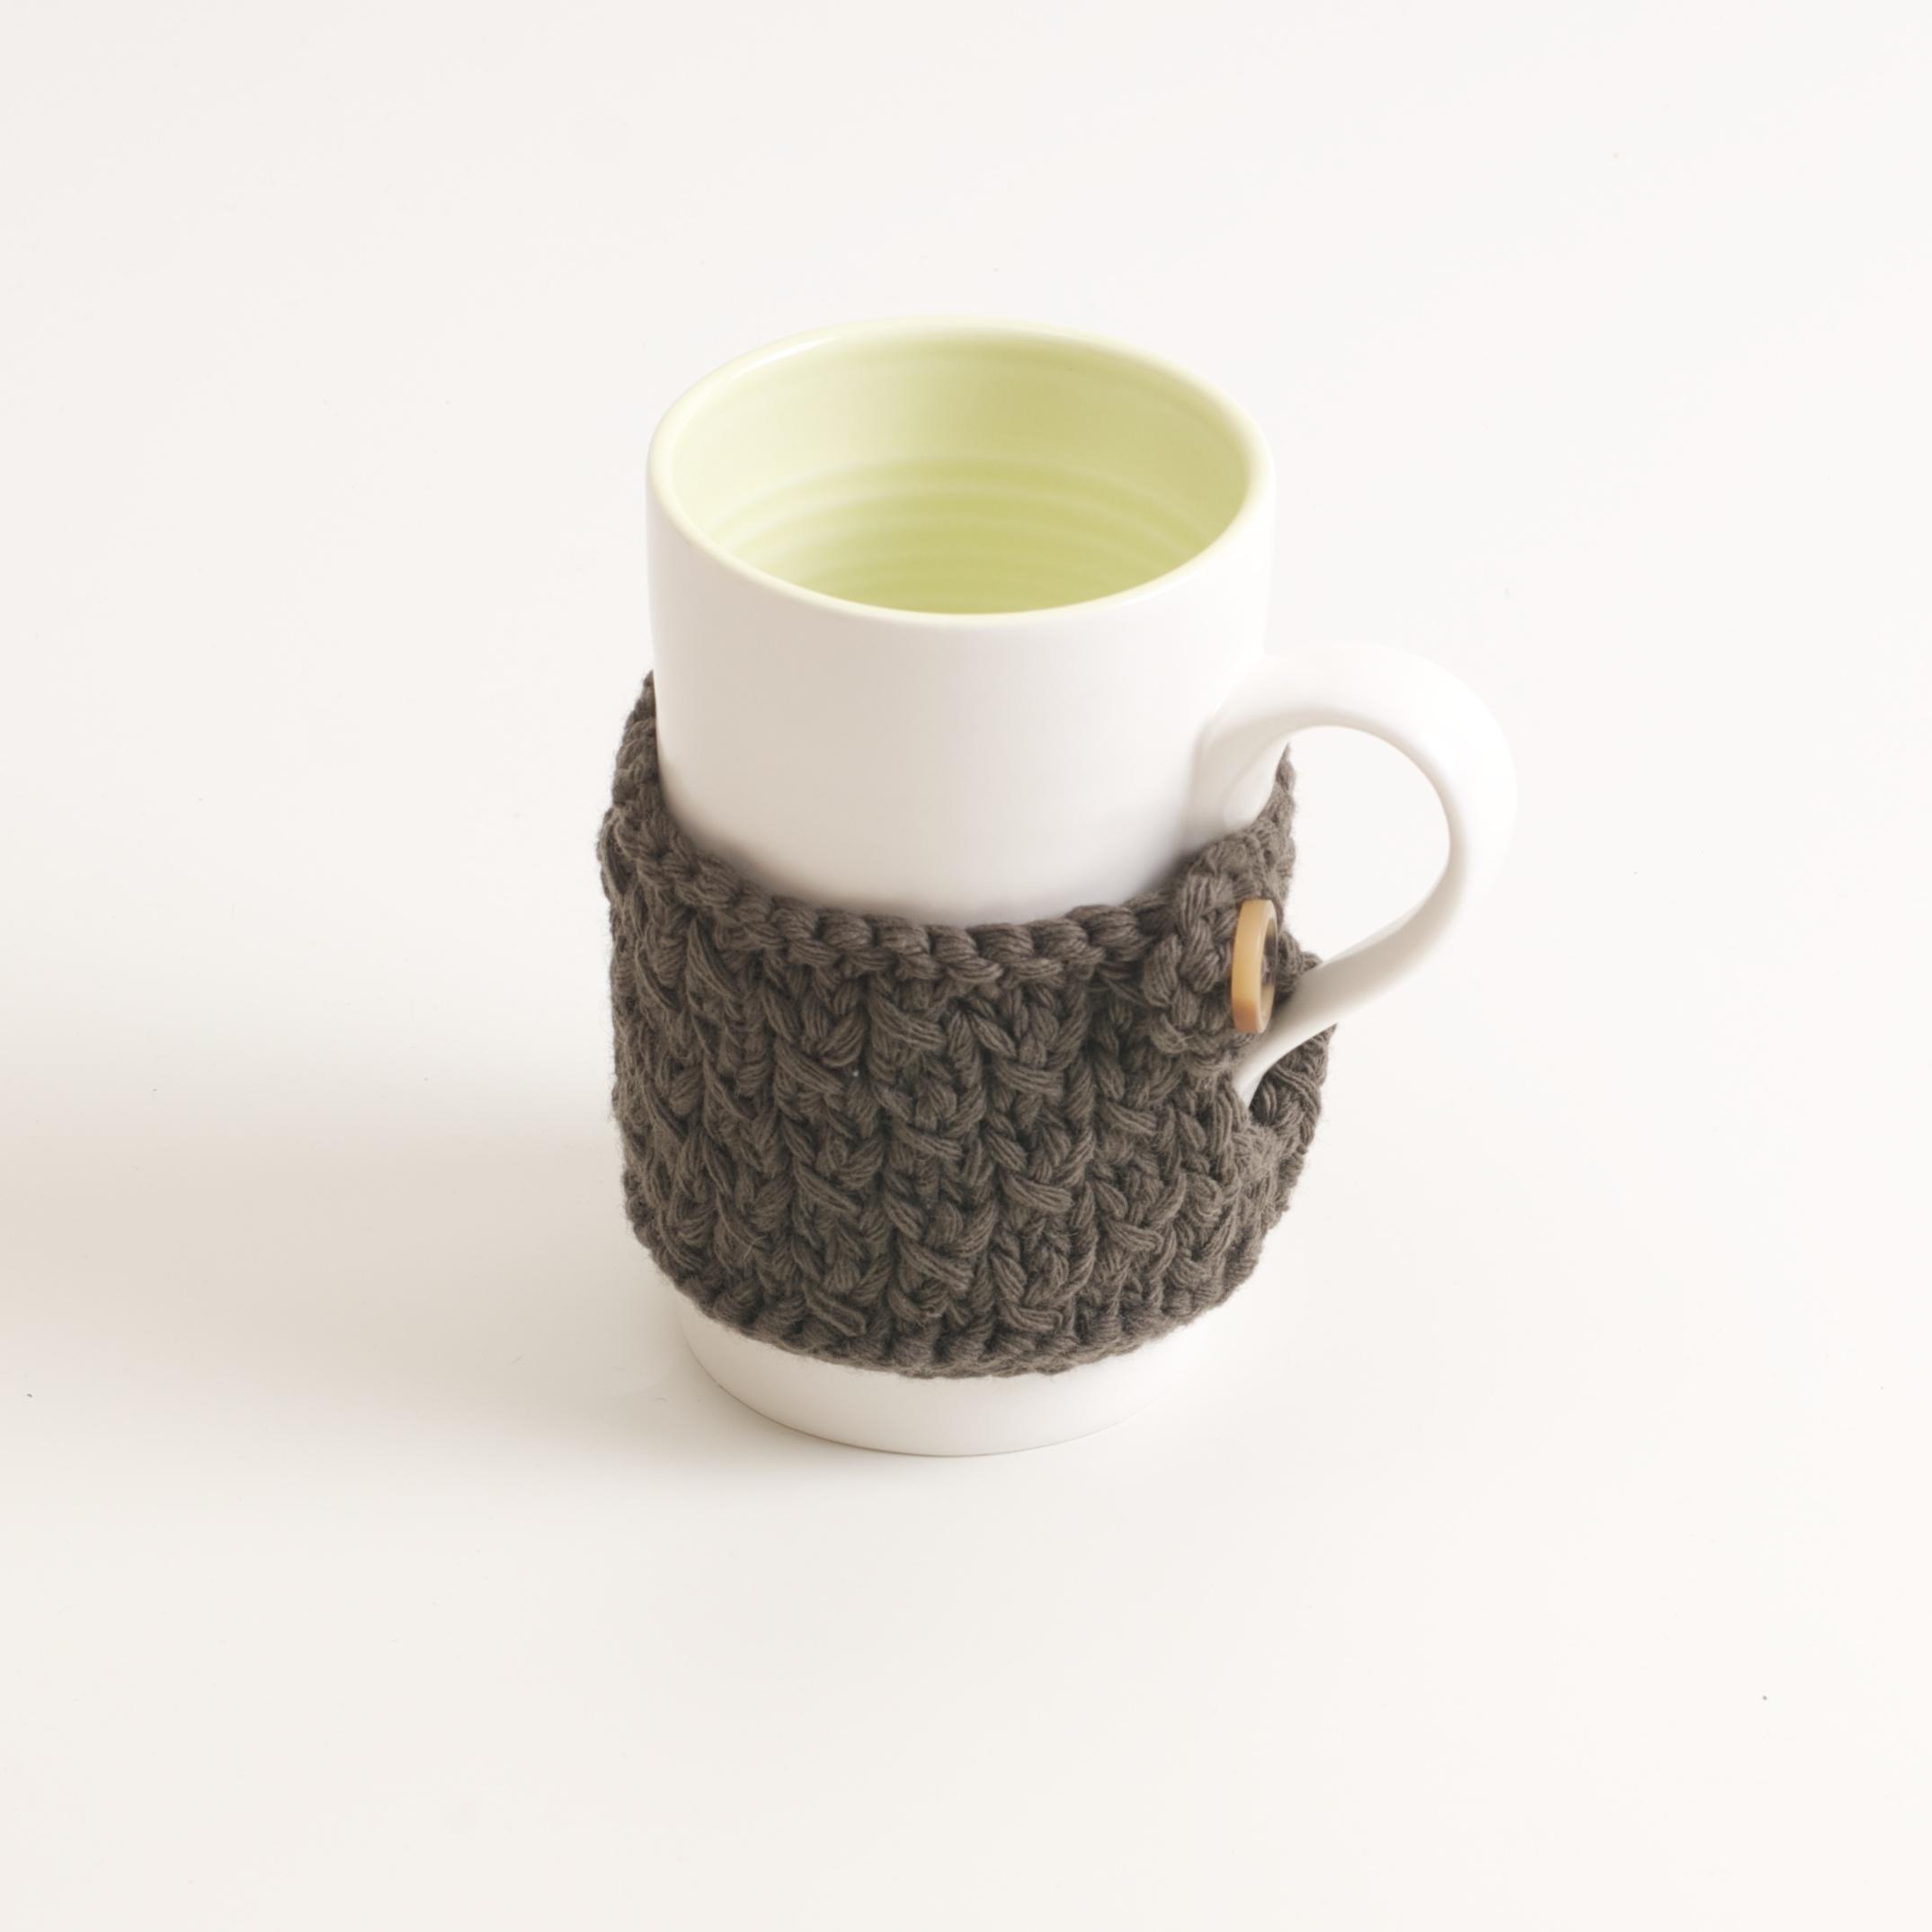 ... porcelain tableware- made in china- citrine mug- linda bloomfield- porcelain designer- ... & Manufactured mug with cosy | Linda Bloomfield